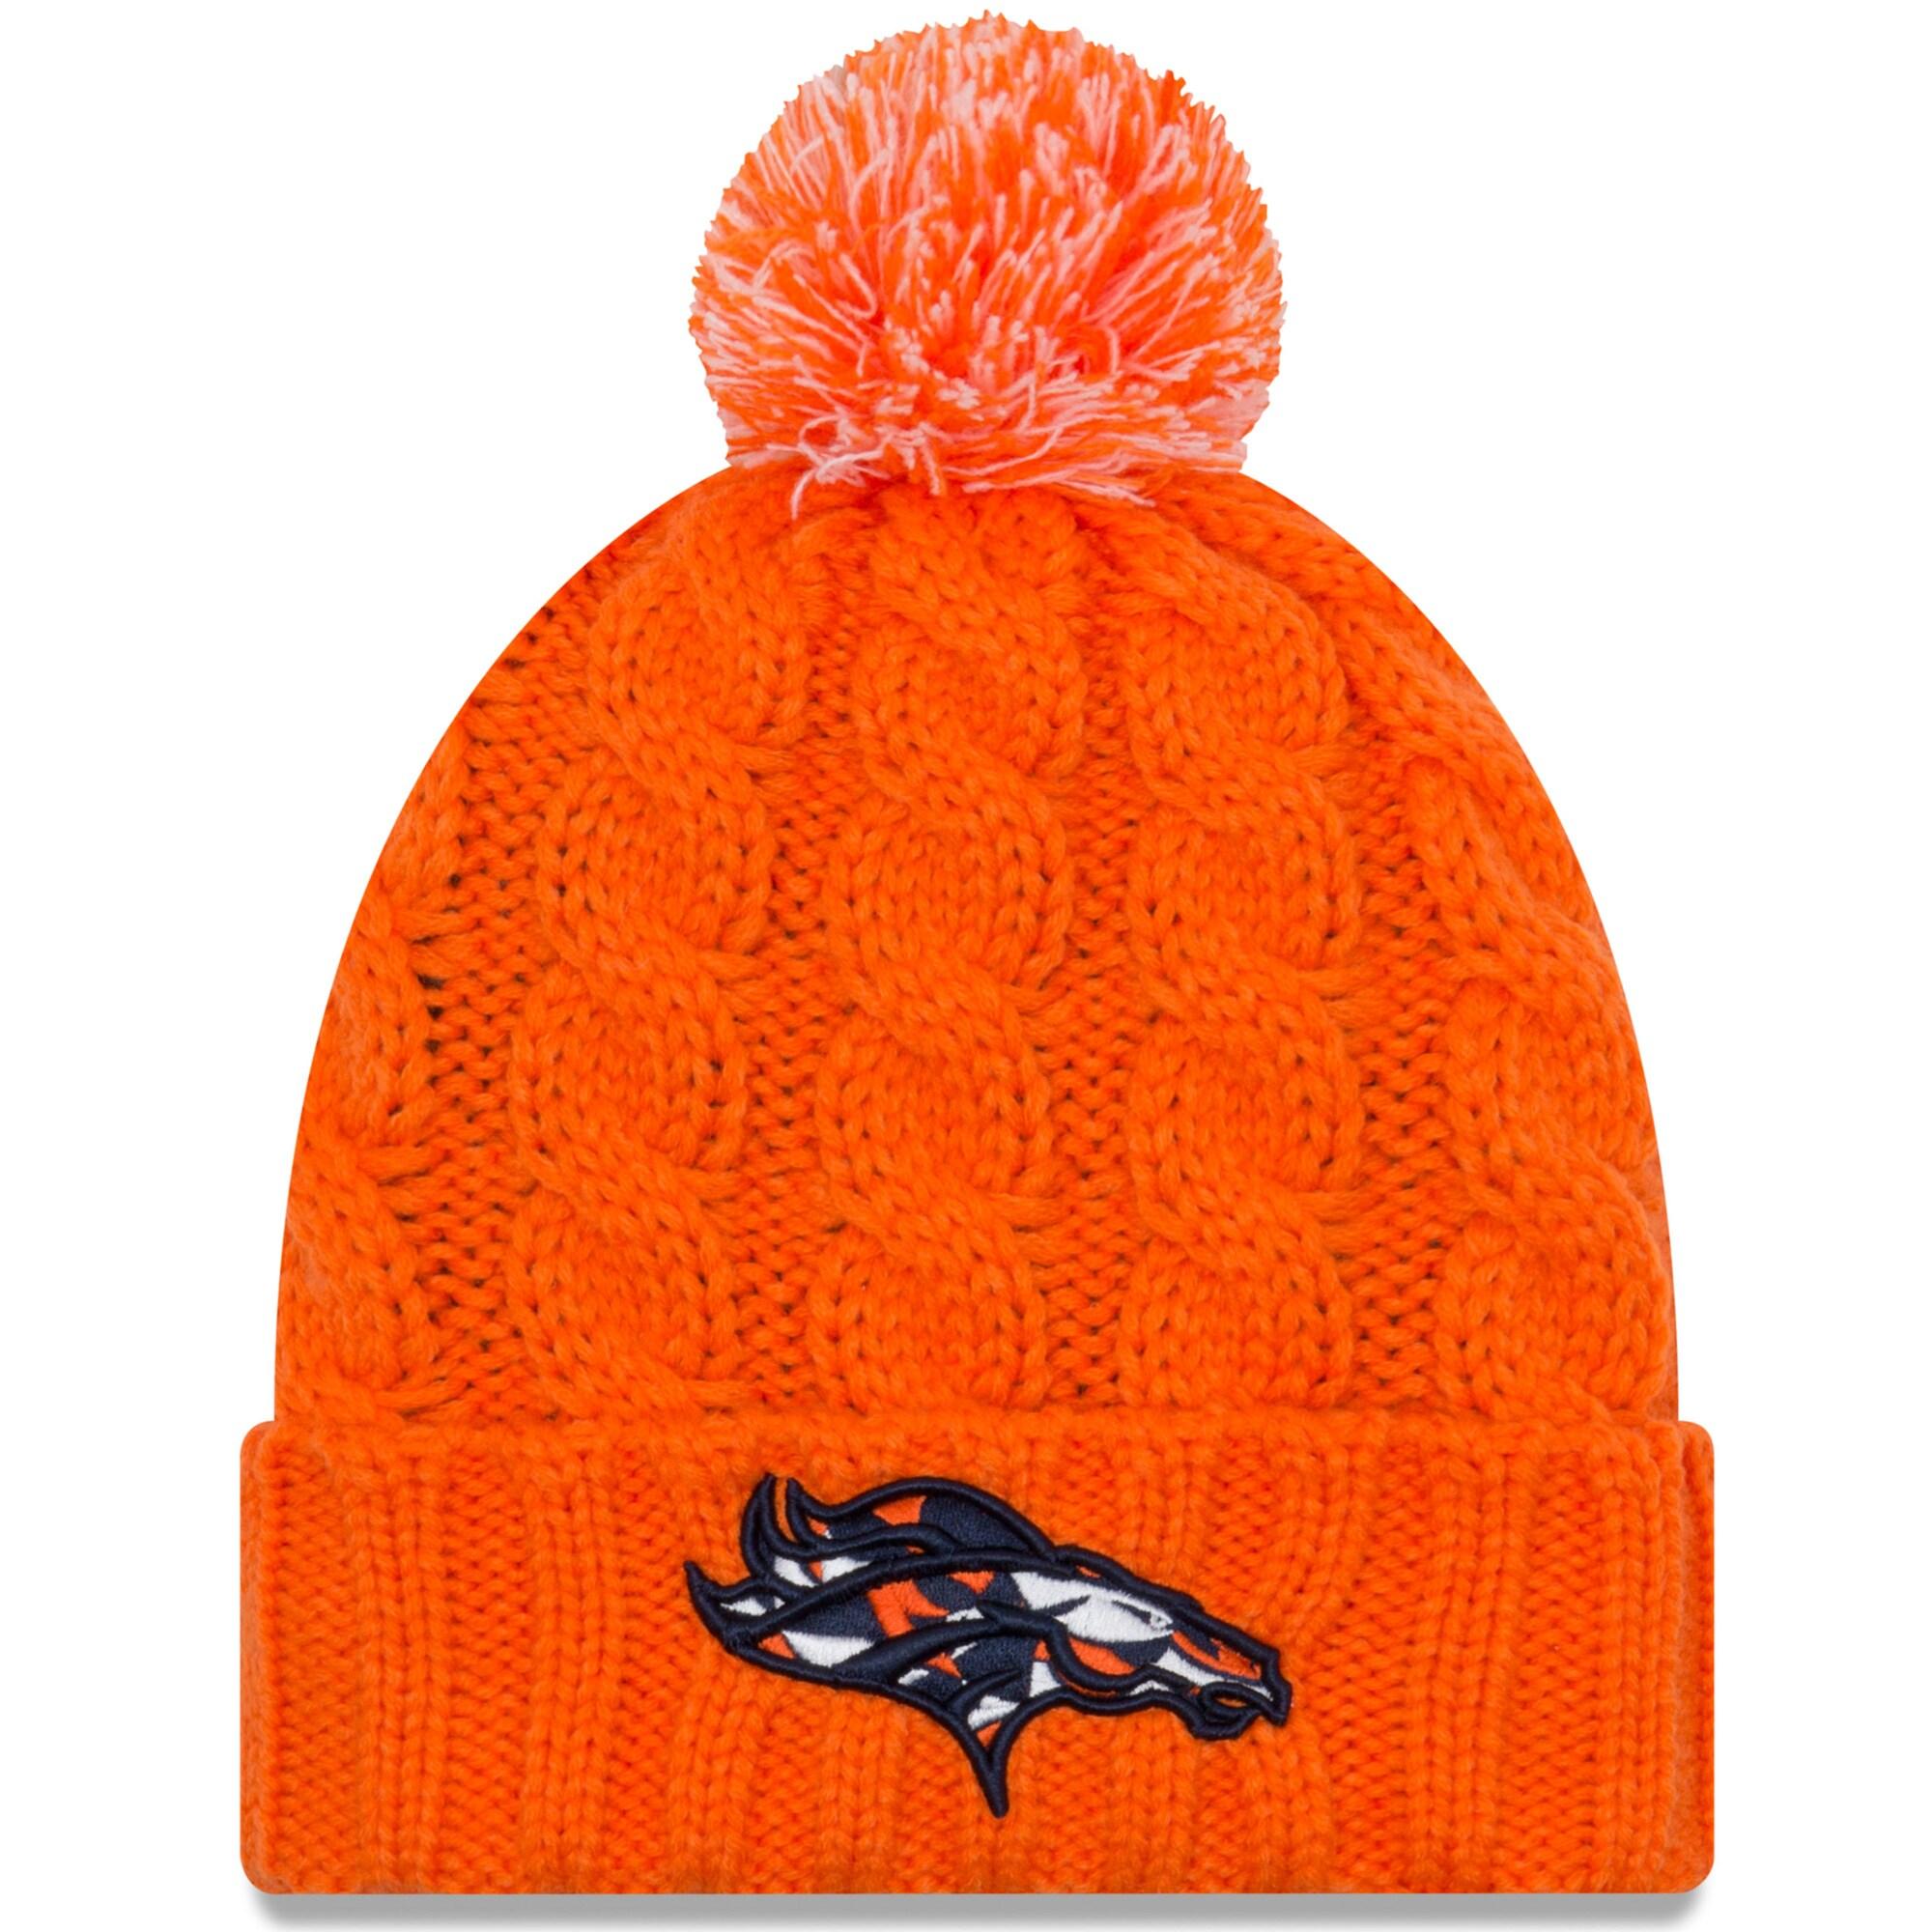 Denver Broncos New Era Women's NFLxFIT Cuffed Knit Hat with Pom - Orange